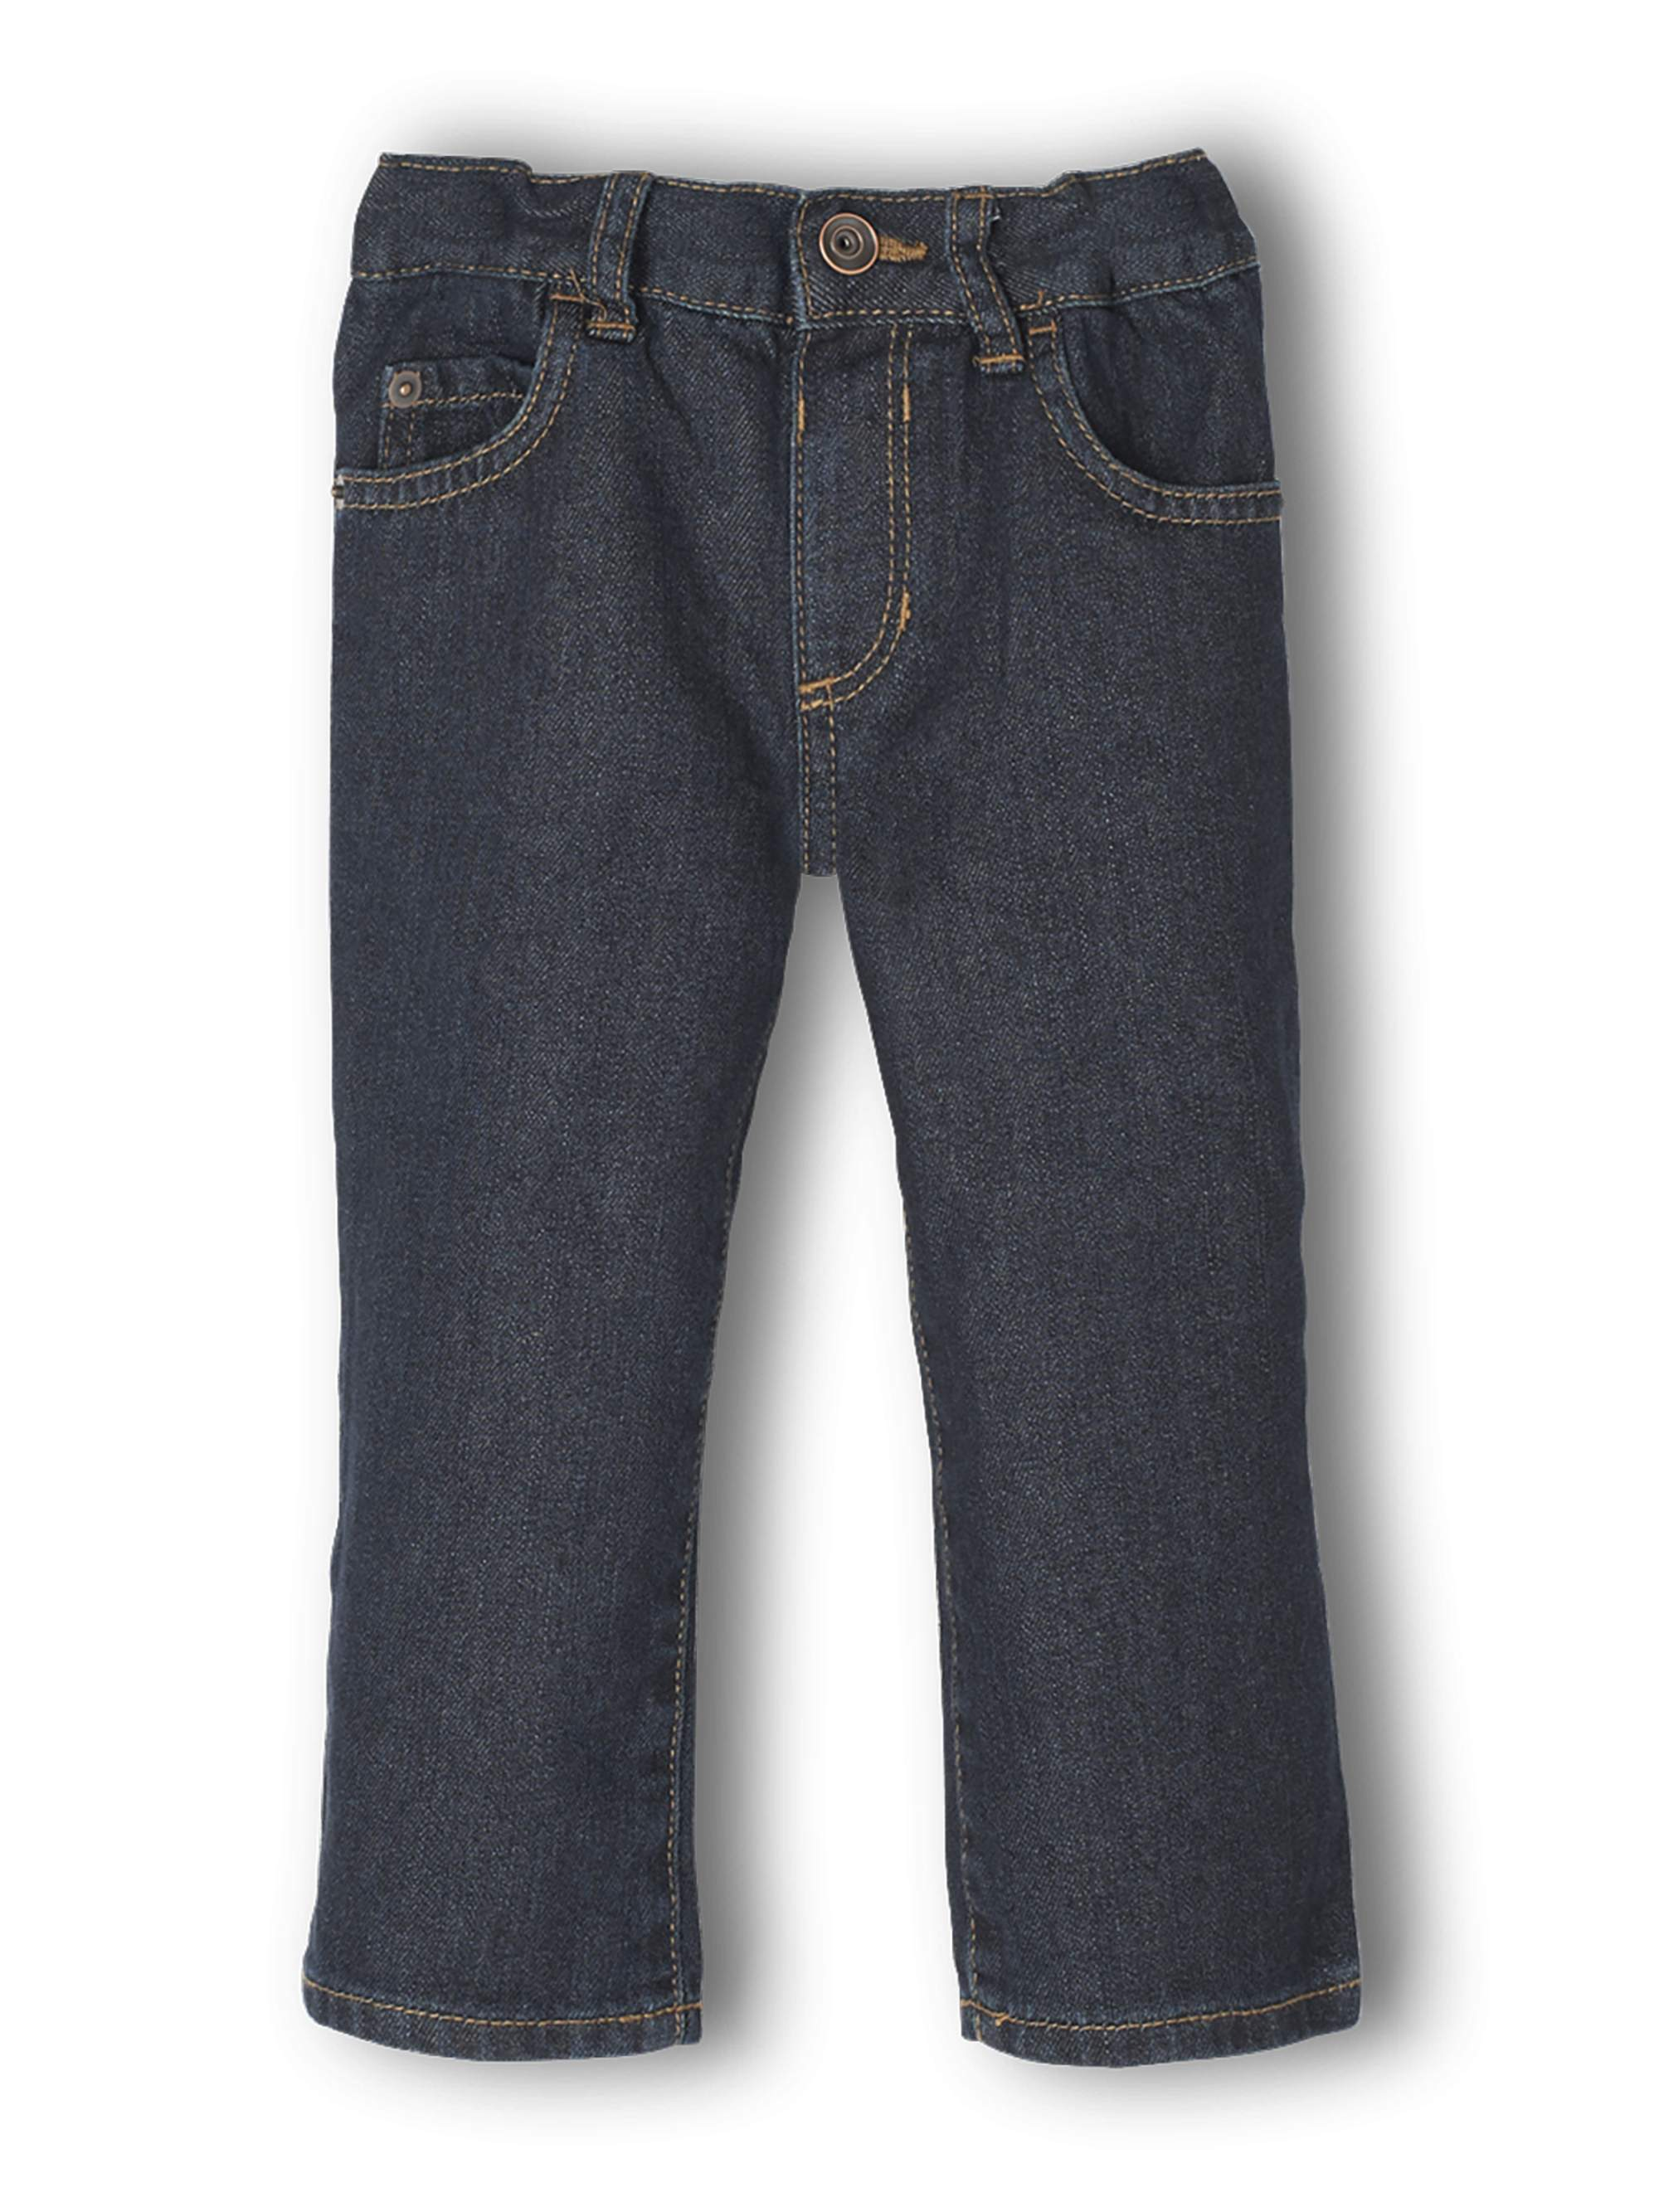 Vintage Straight Jeans (Toddler Boys)